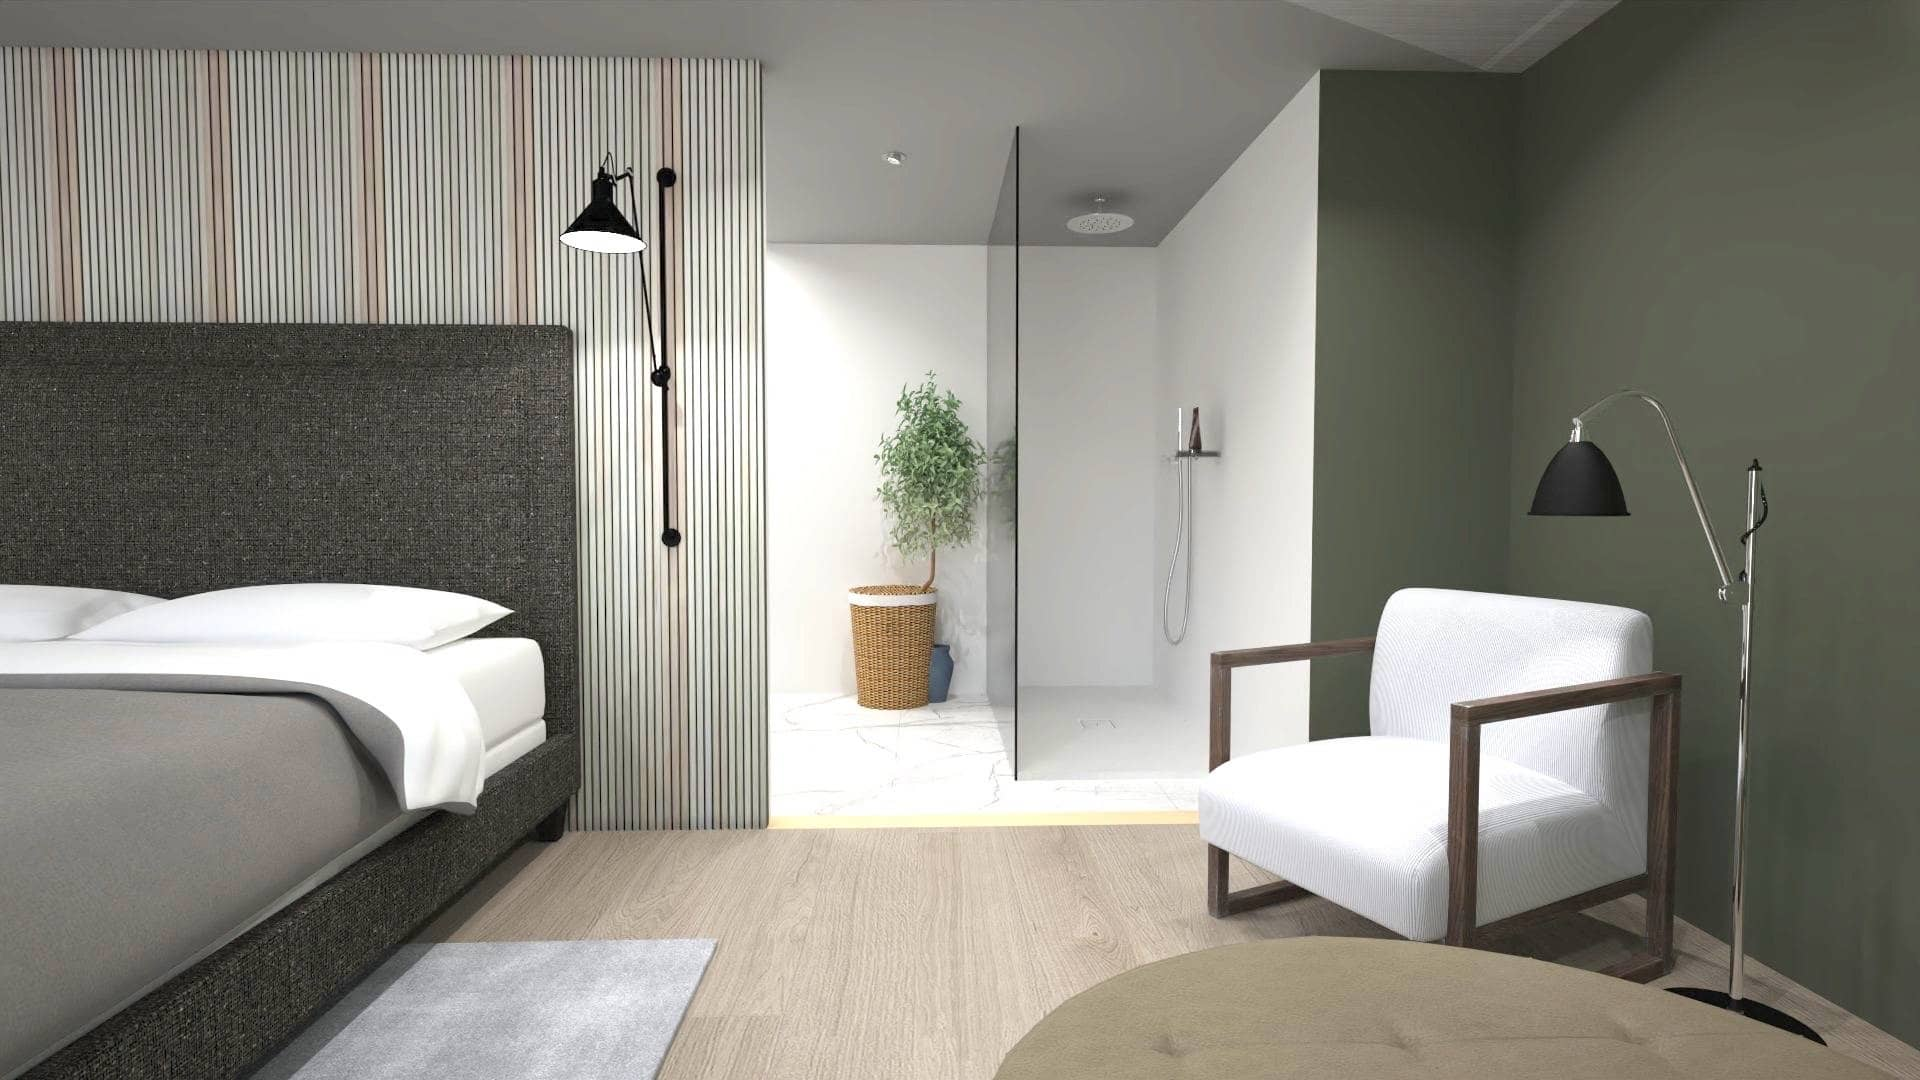 Interior design, Bed, Tile, Wall, Building, Floor, Bedroom, Property, Furniture, Room